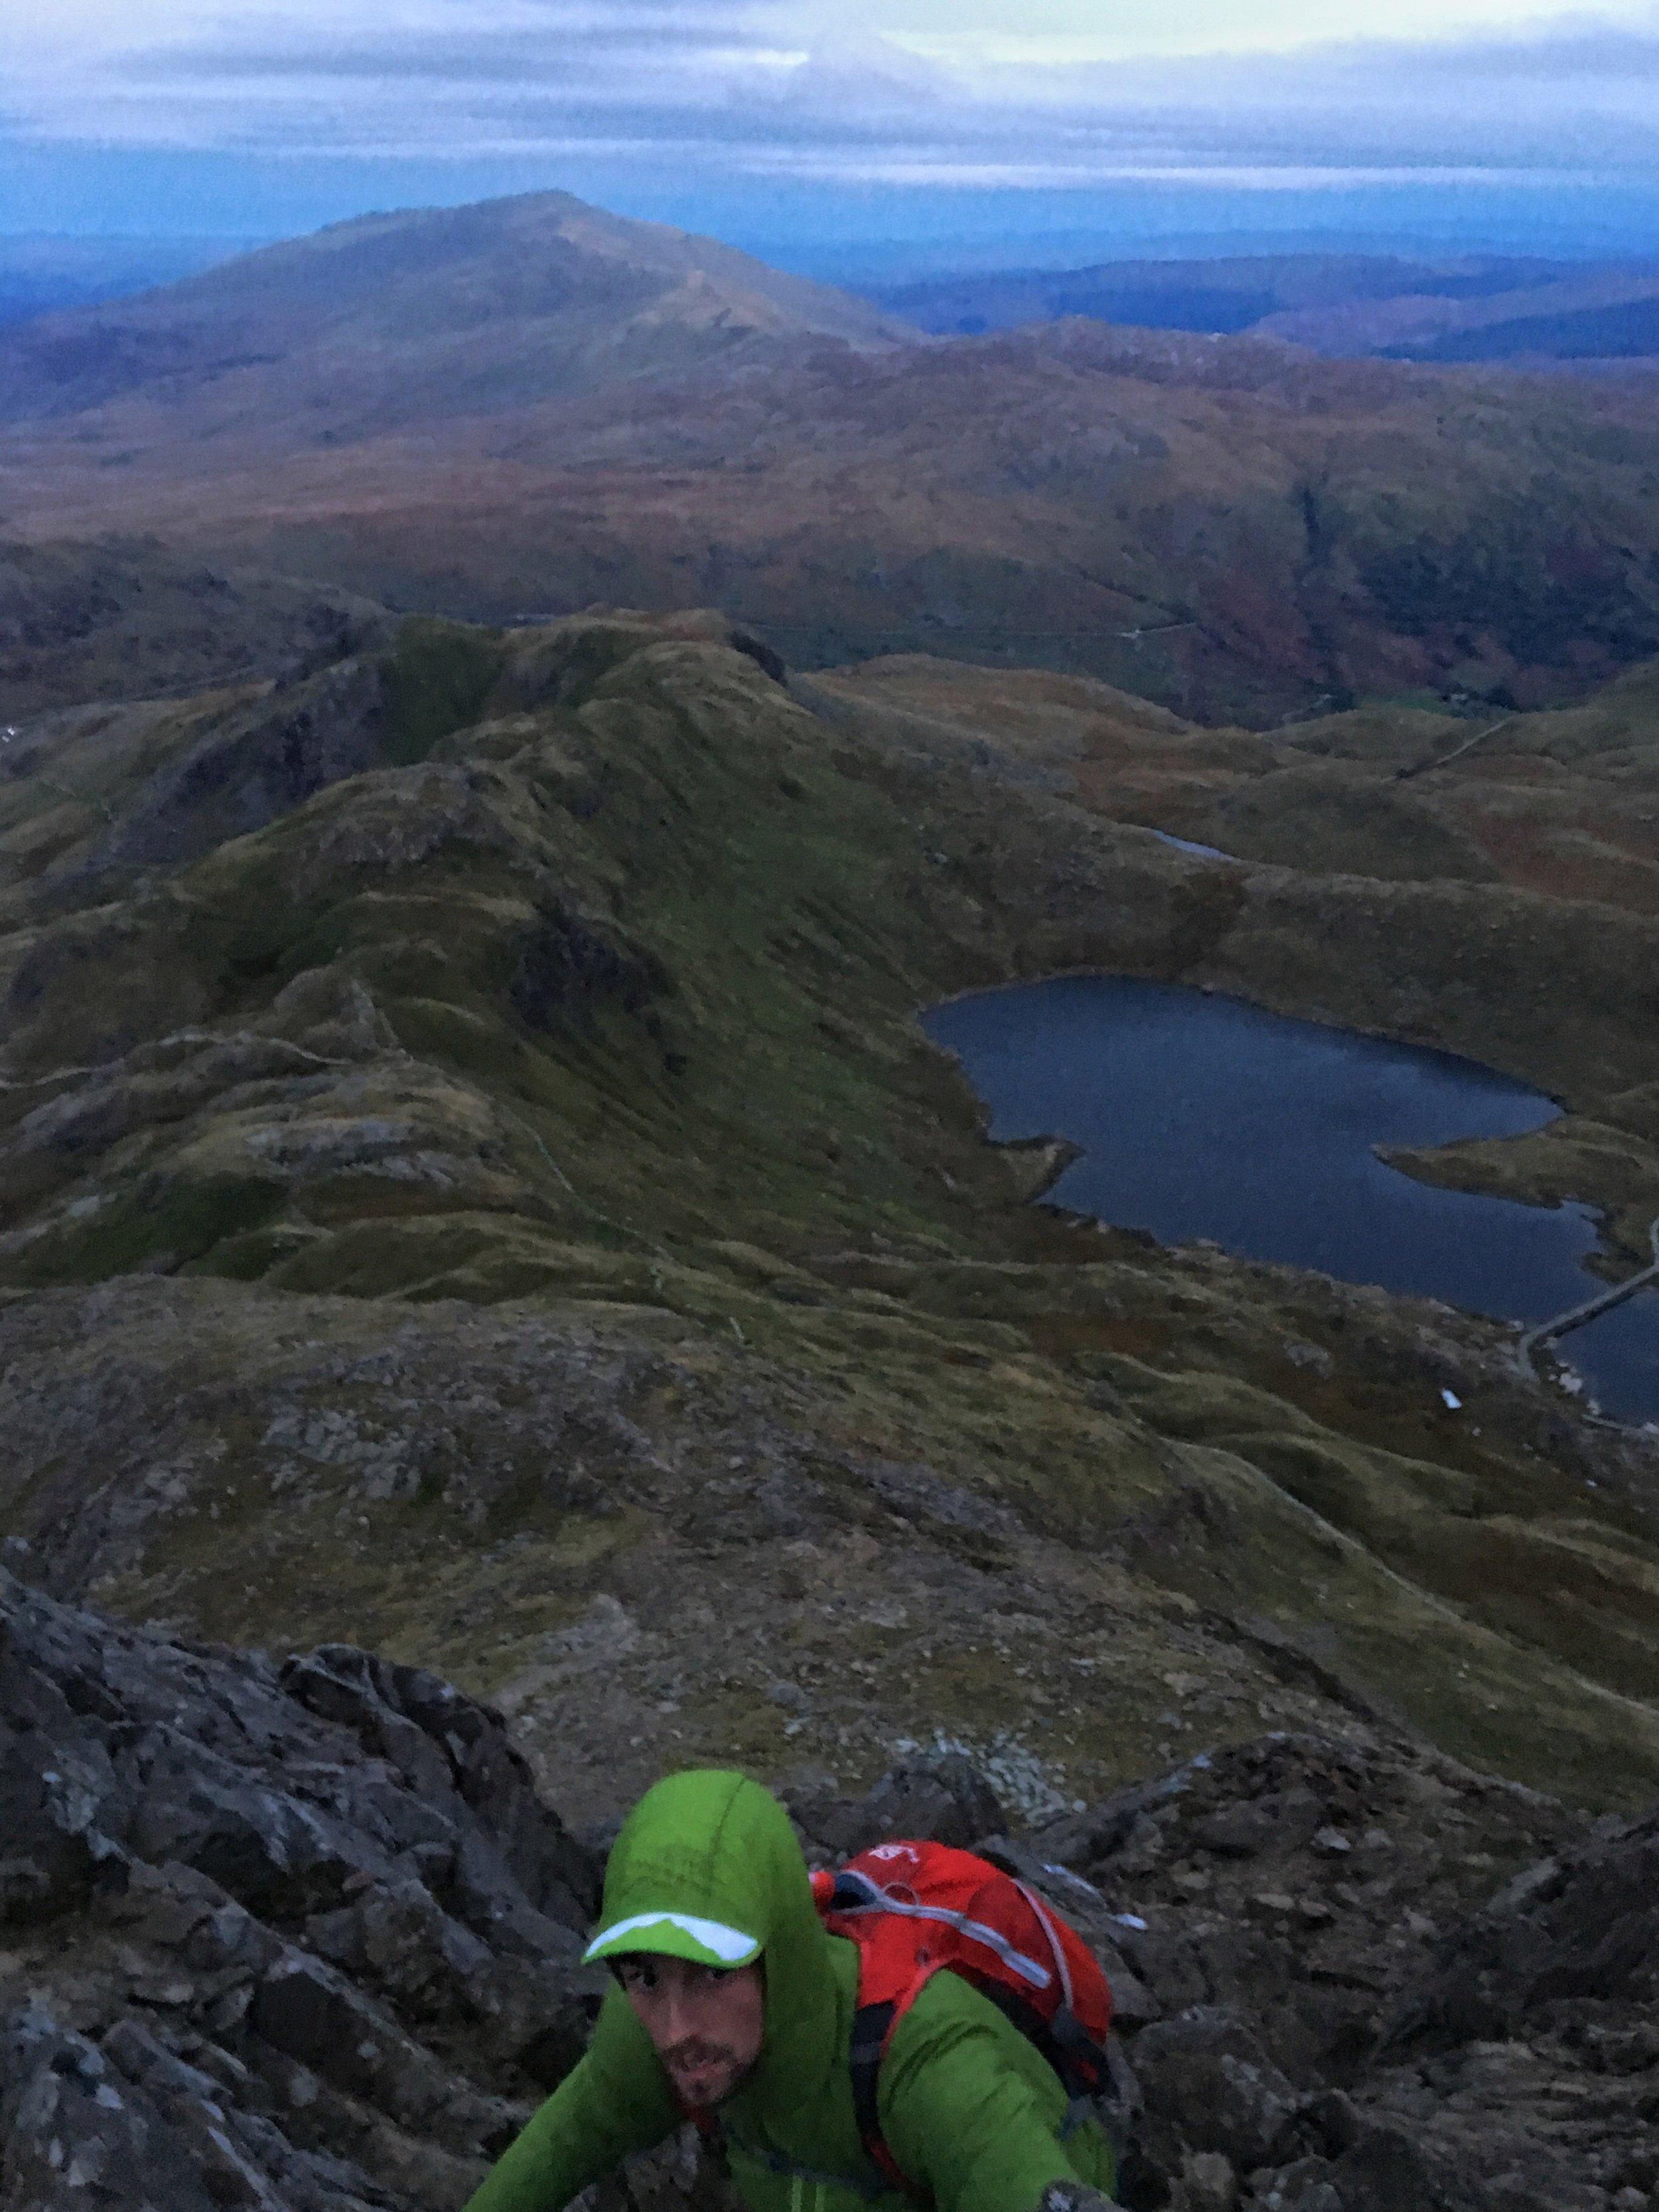 Climbing up Snowdon